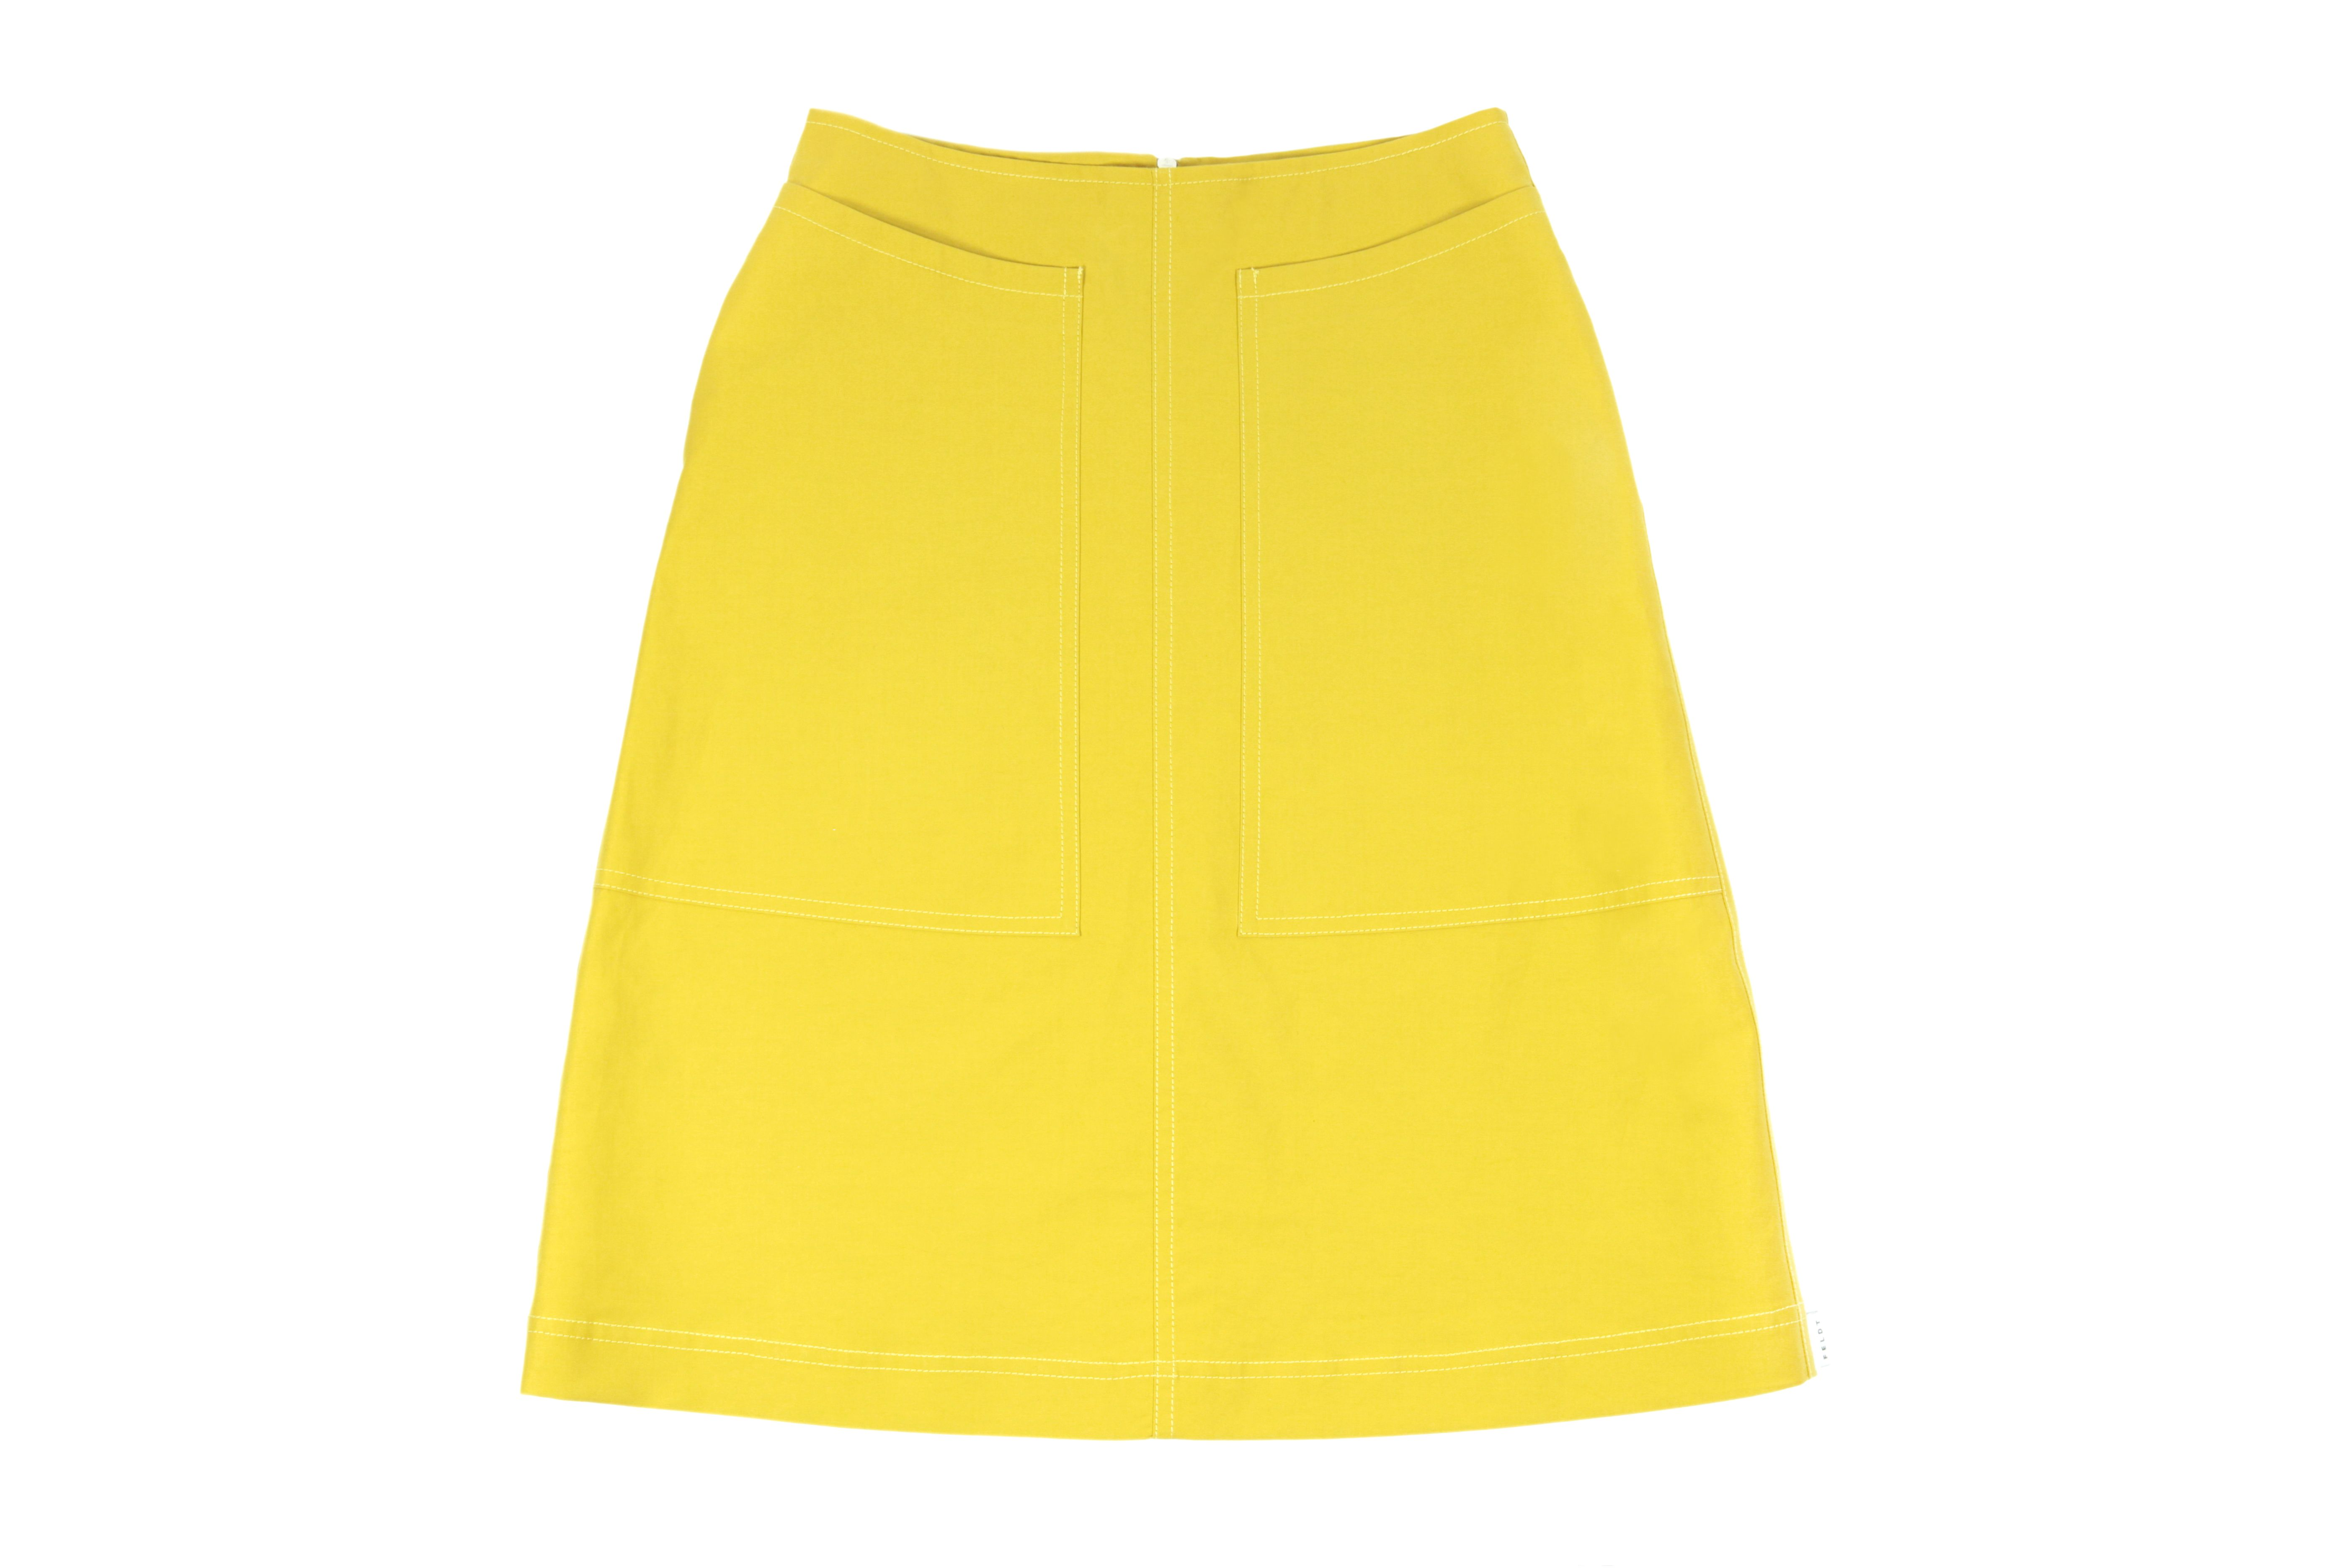 Feldt SS15 Yellow Midi Skirt